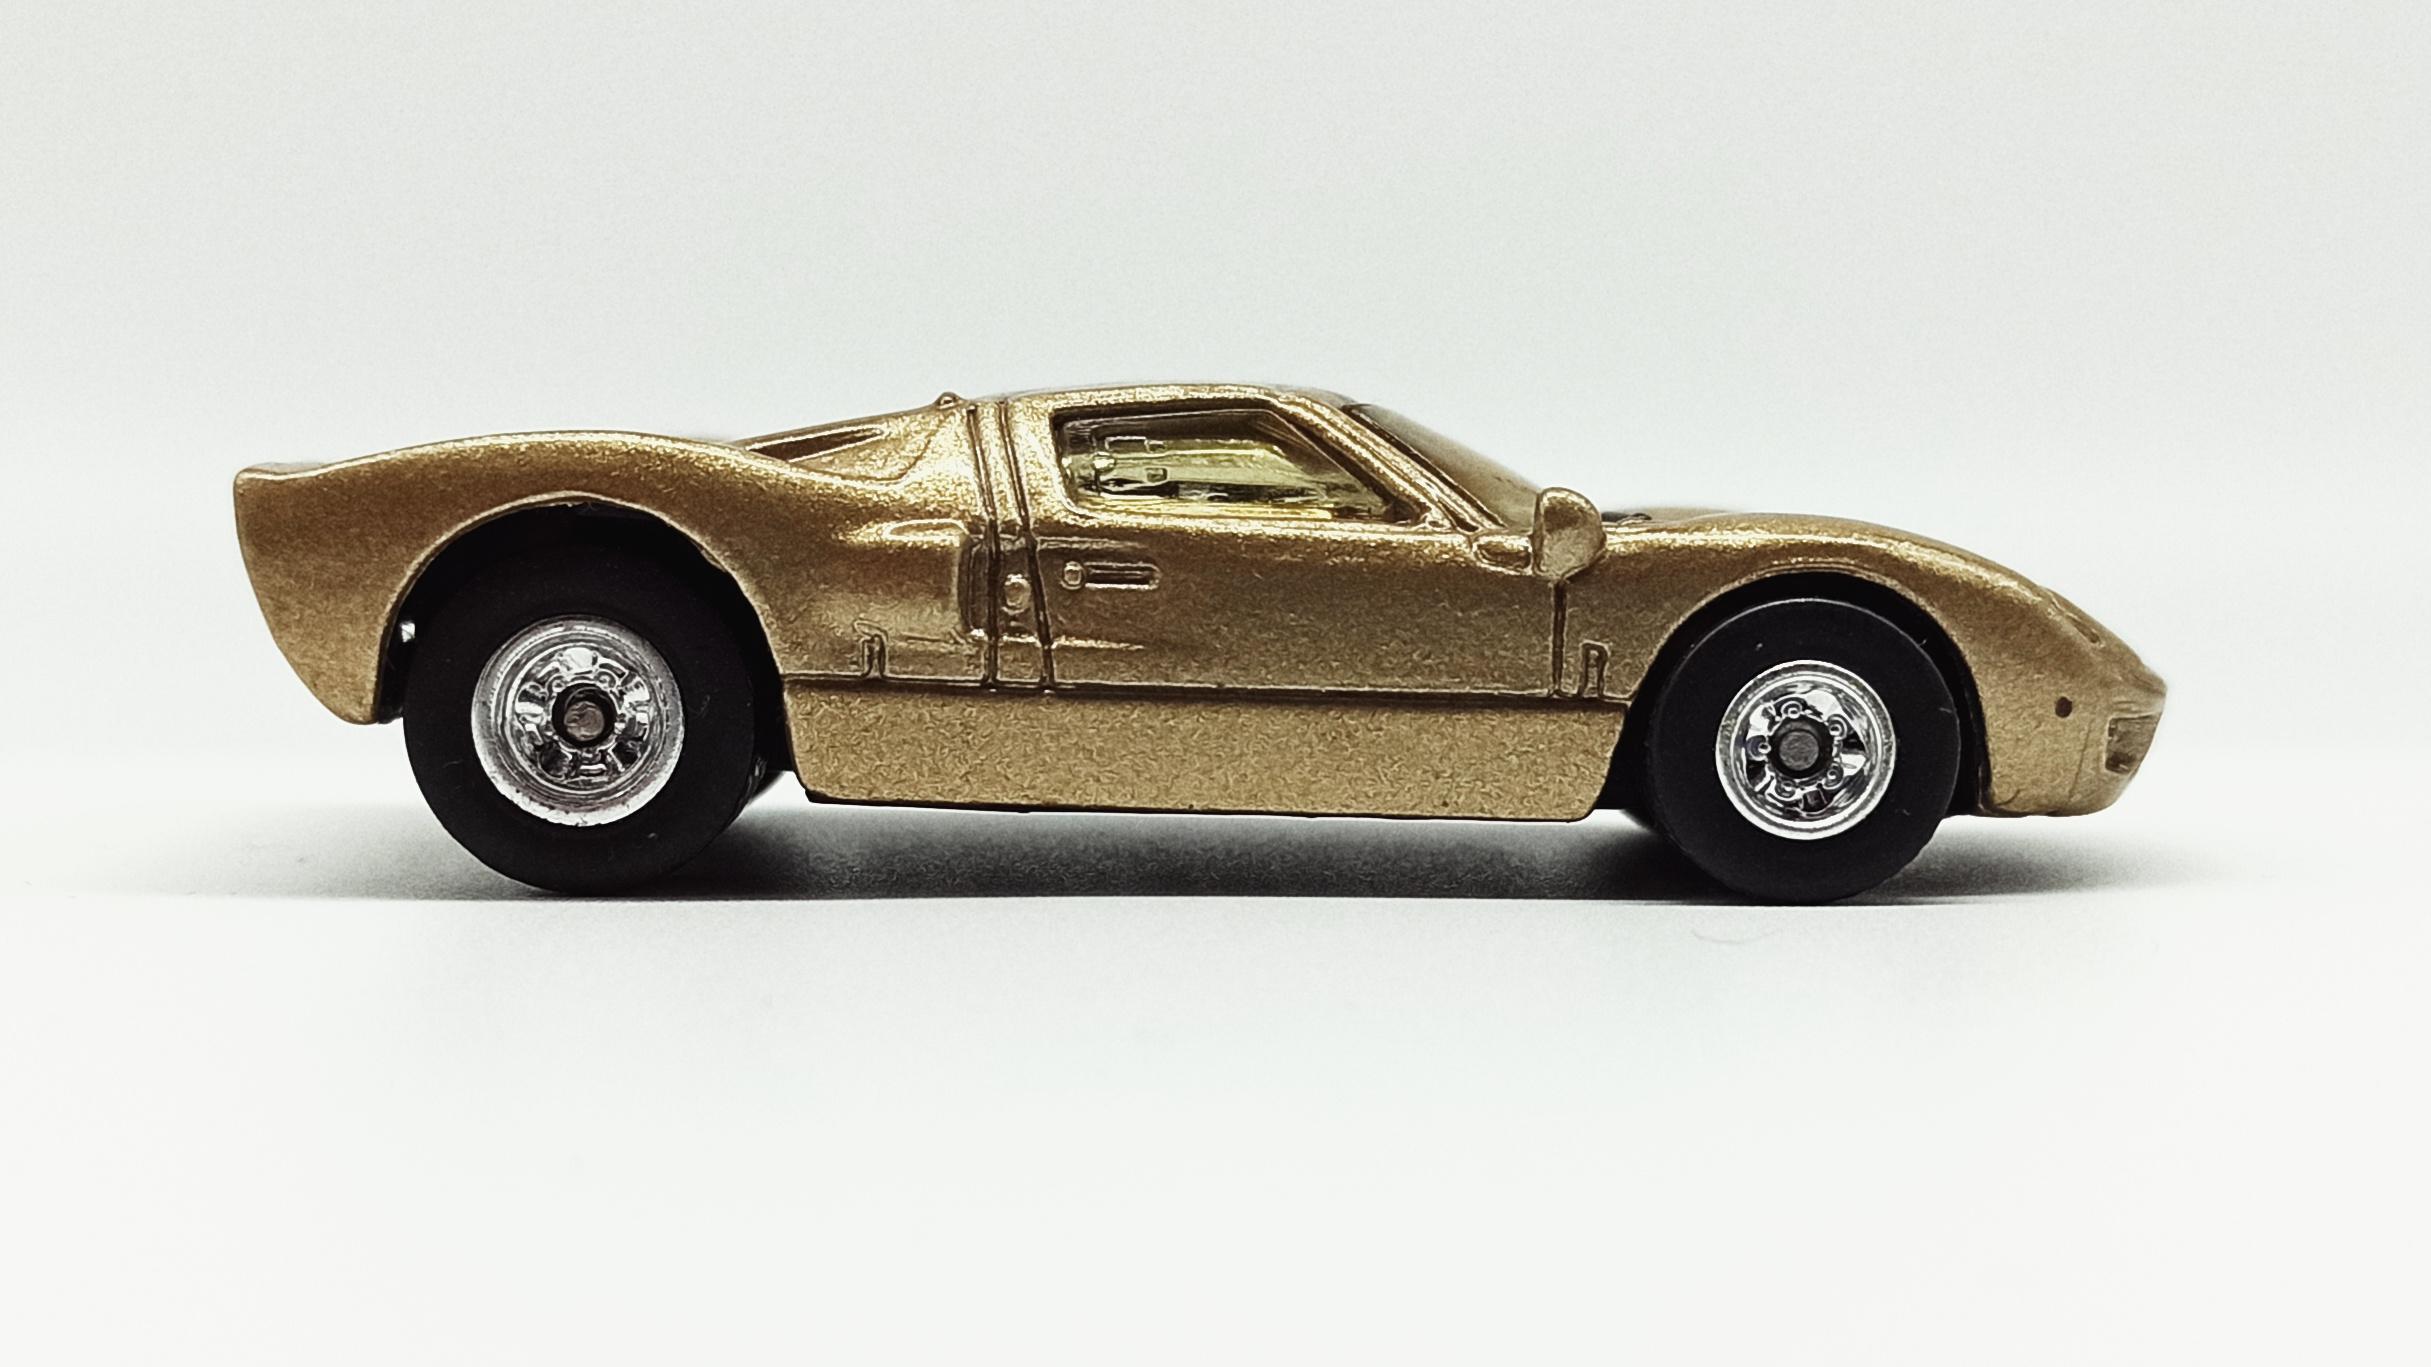 Hot Wheels Ford GT-40 (26381) 2000 59 Treasure Hunts (11/12) metalflake gold side